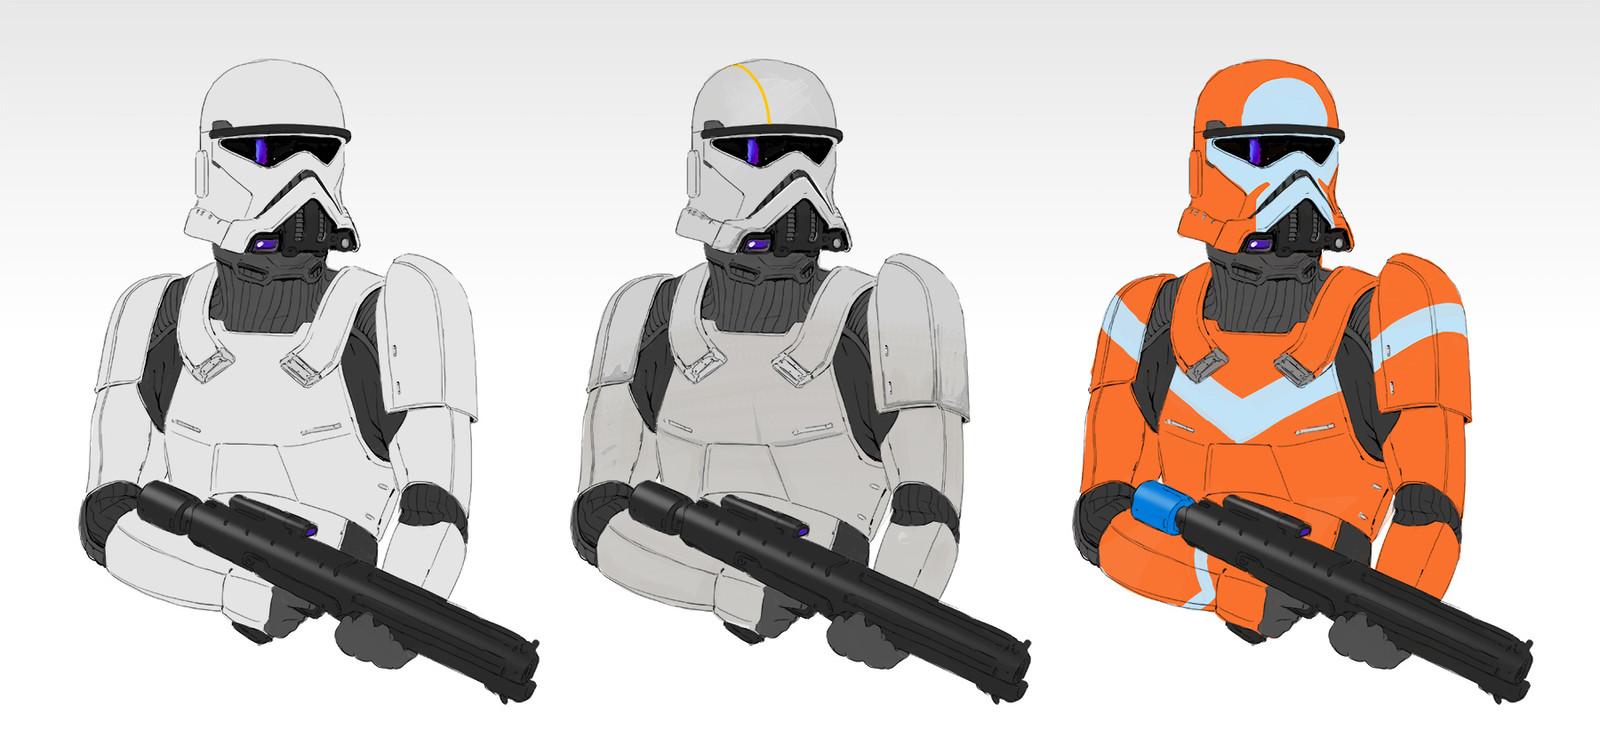 Star Wars stormtrooper redesign